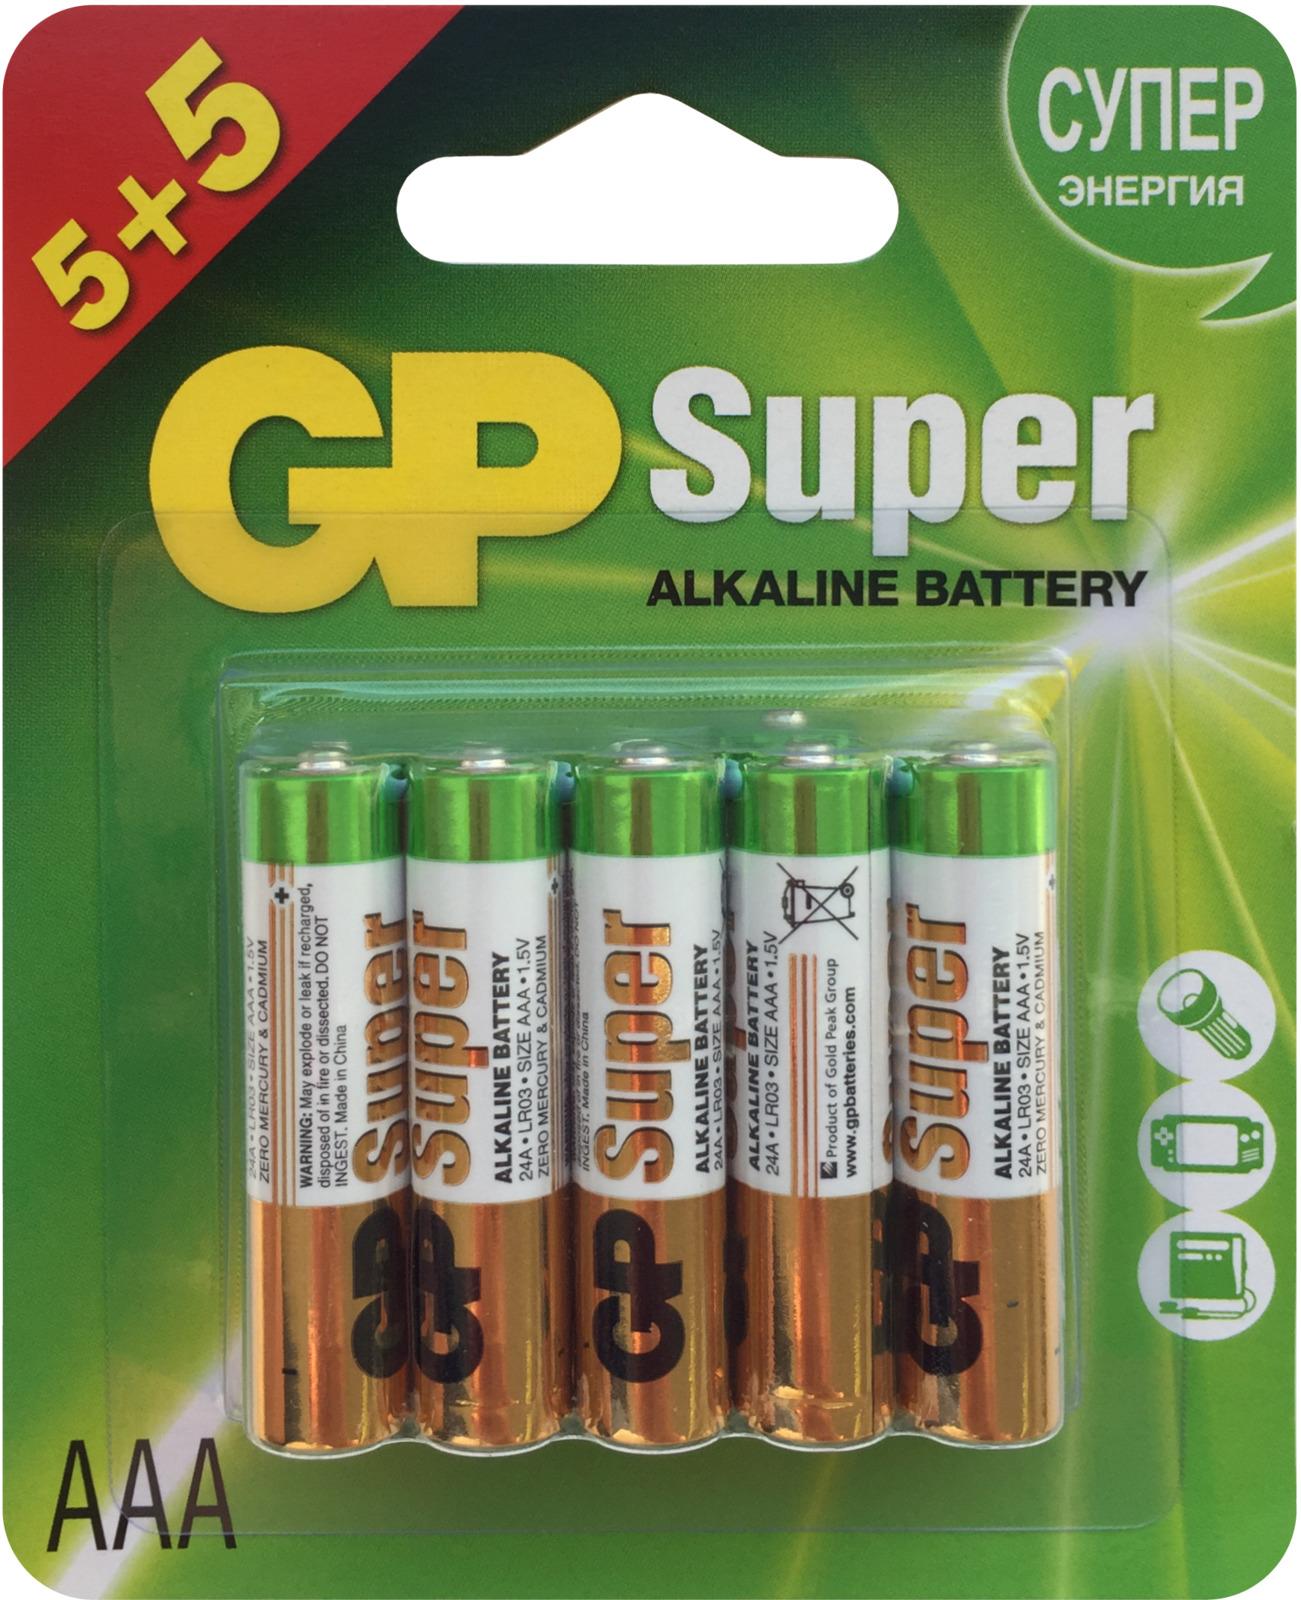 Батарейка щелочная GP Batteries, тип ААА, 10 шт батарейка алкалиновая gp batteries тип ааа 6 шт подарок батарейка алкалиновая gp batteries тип ааа 2 шт